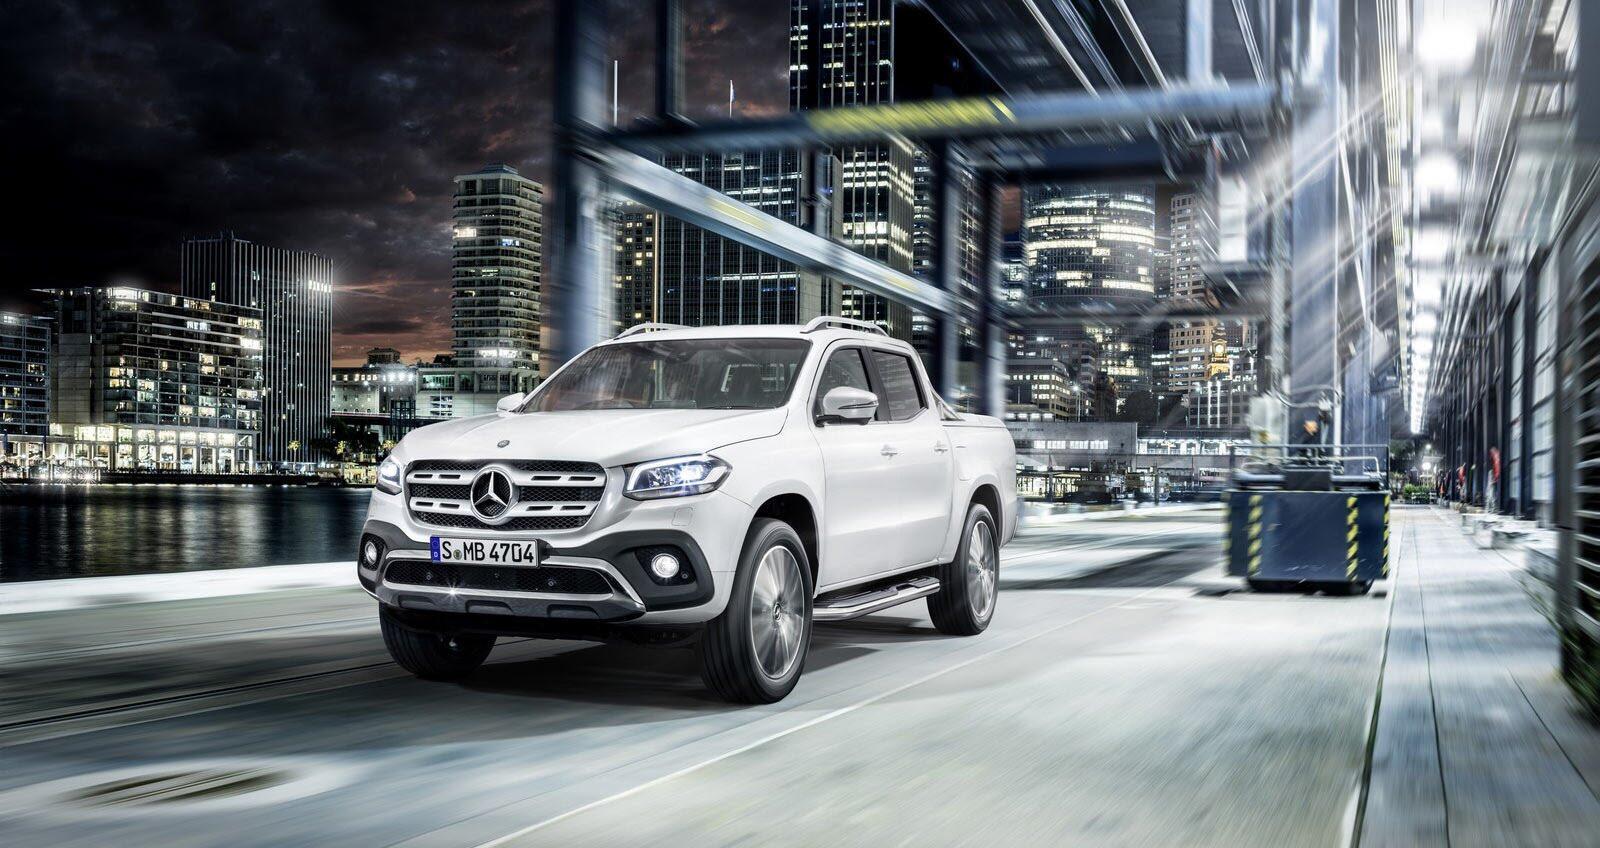 Ảnh chi tiết Mercedes-Benz X-Class - Hình 13